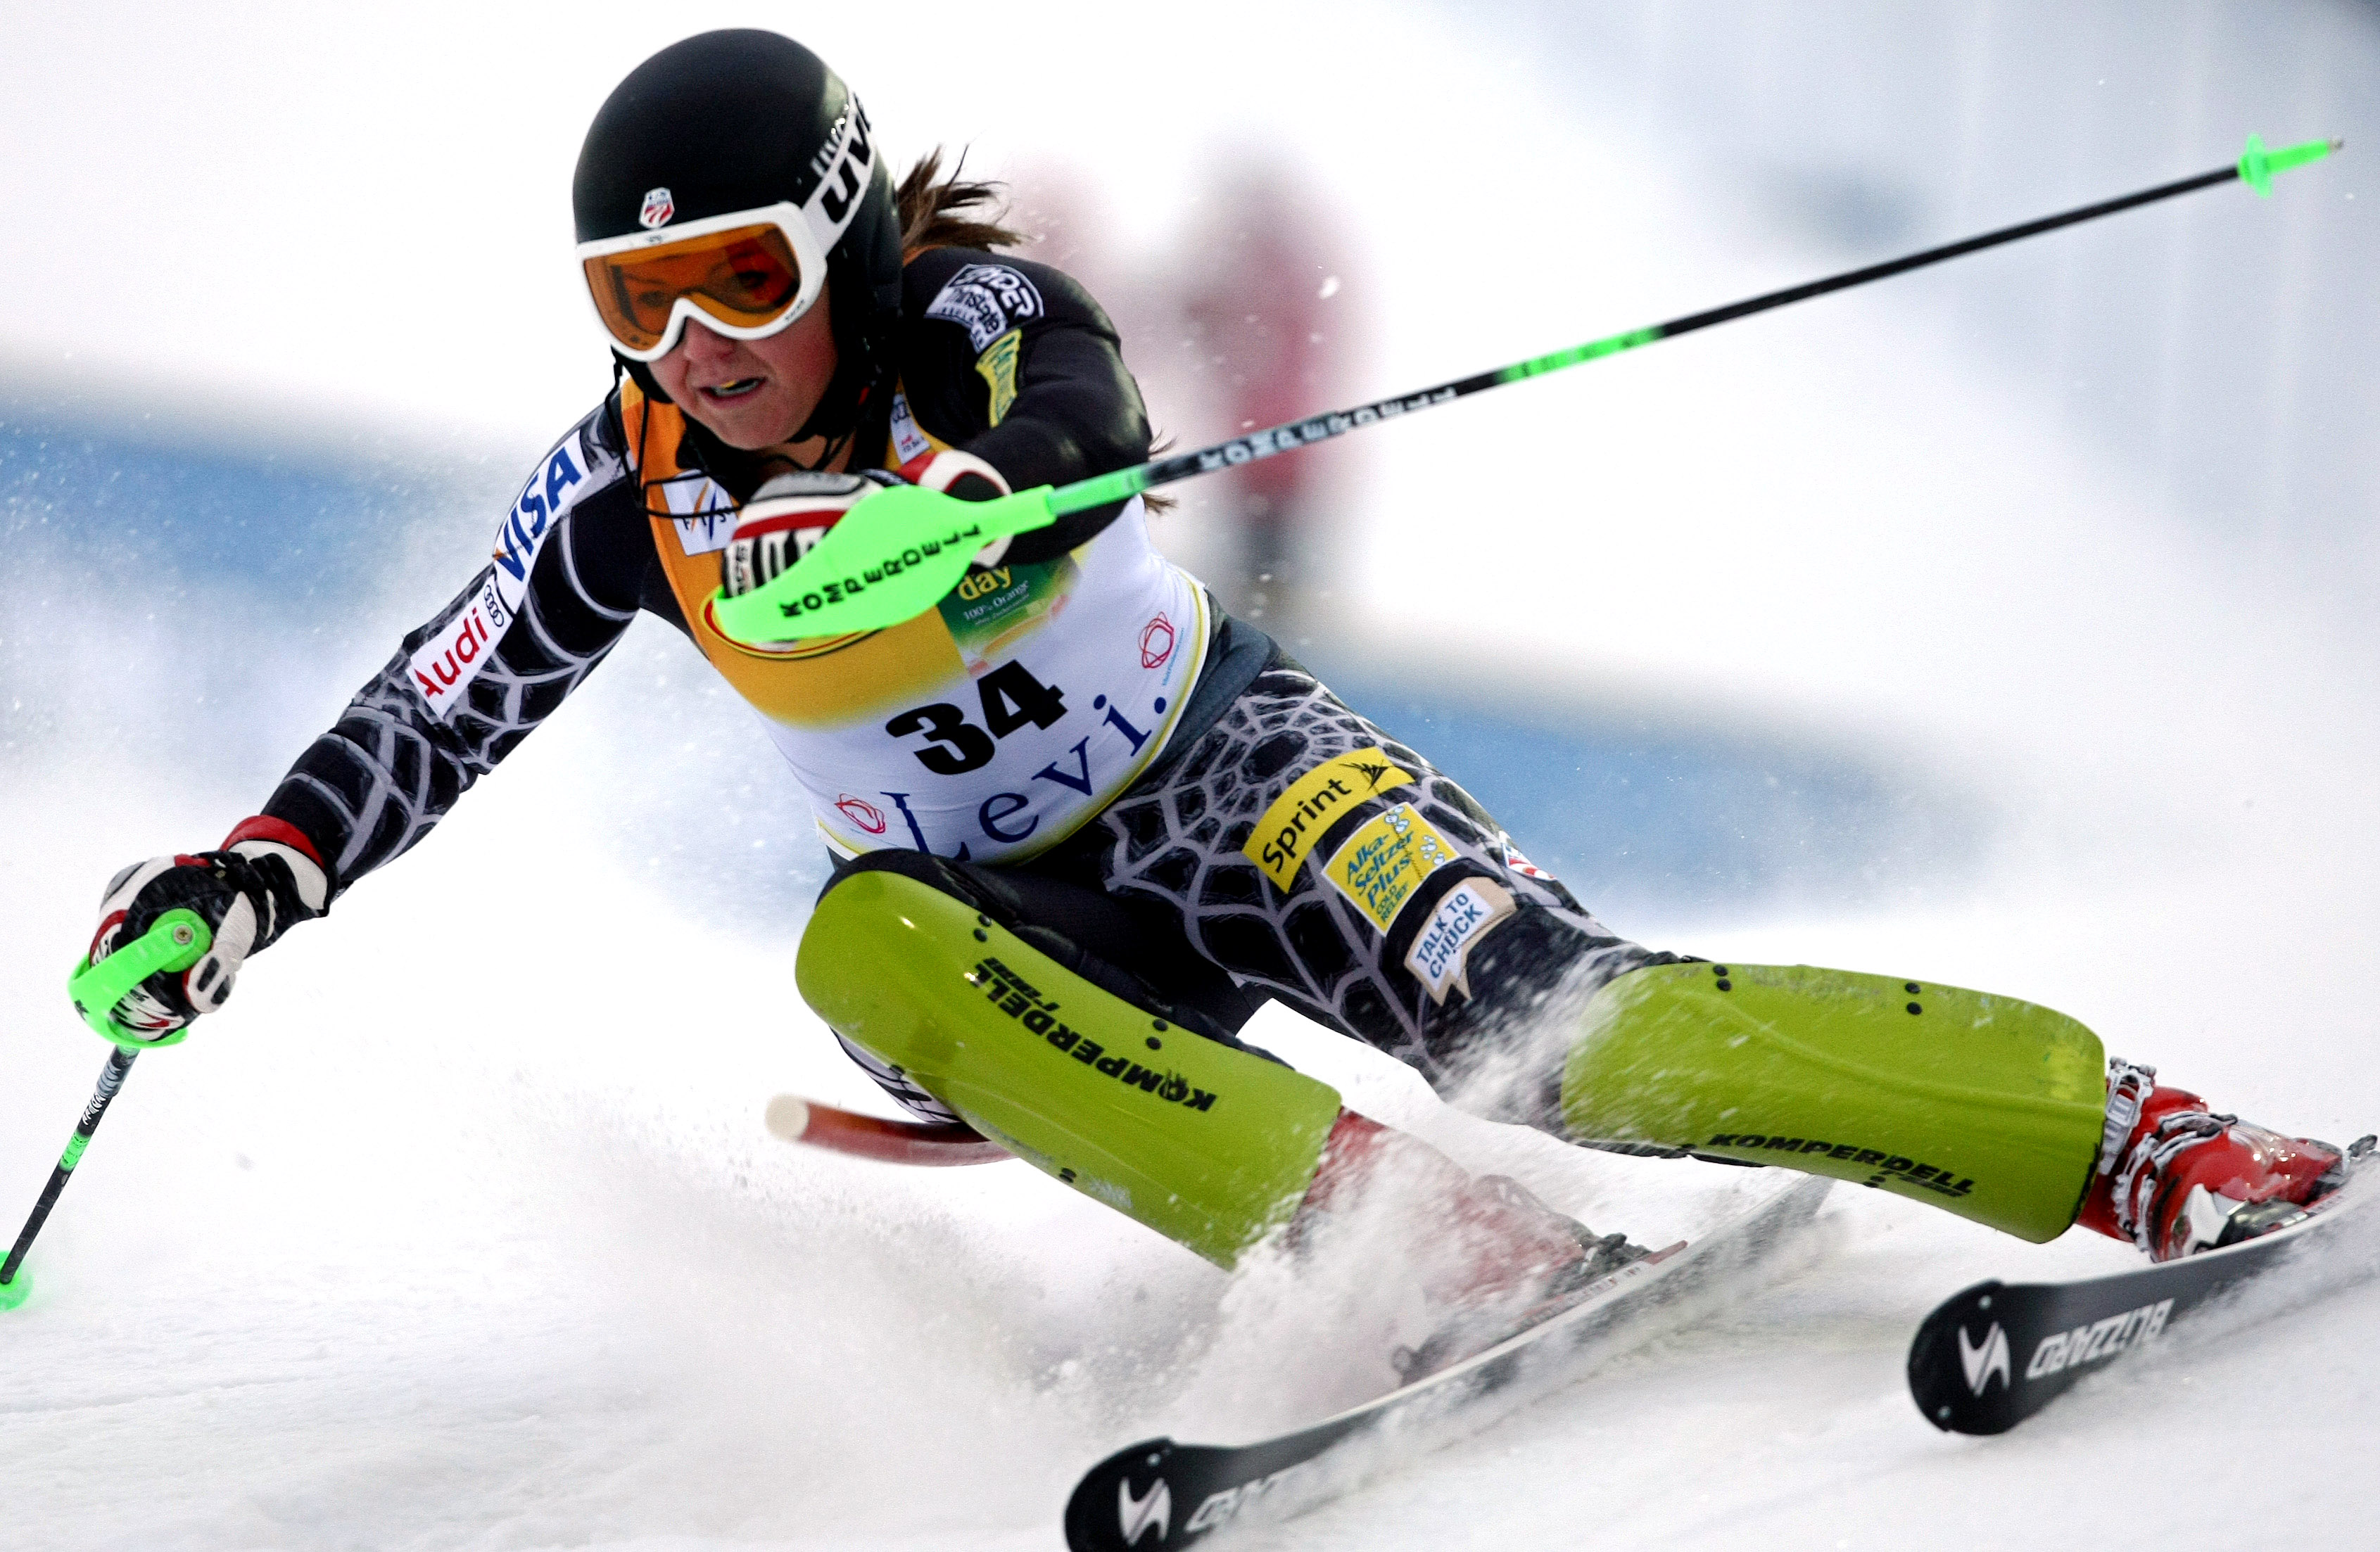 GEPA-14110912063 - LEVI,FINNLAND,14.NOV.09 - SKI ALPIN - FIS Weltcup, Slalom der Damen. Bild zeigt Sterling Grant (USA). Foto: GEPA pictures/ Walter Luger